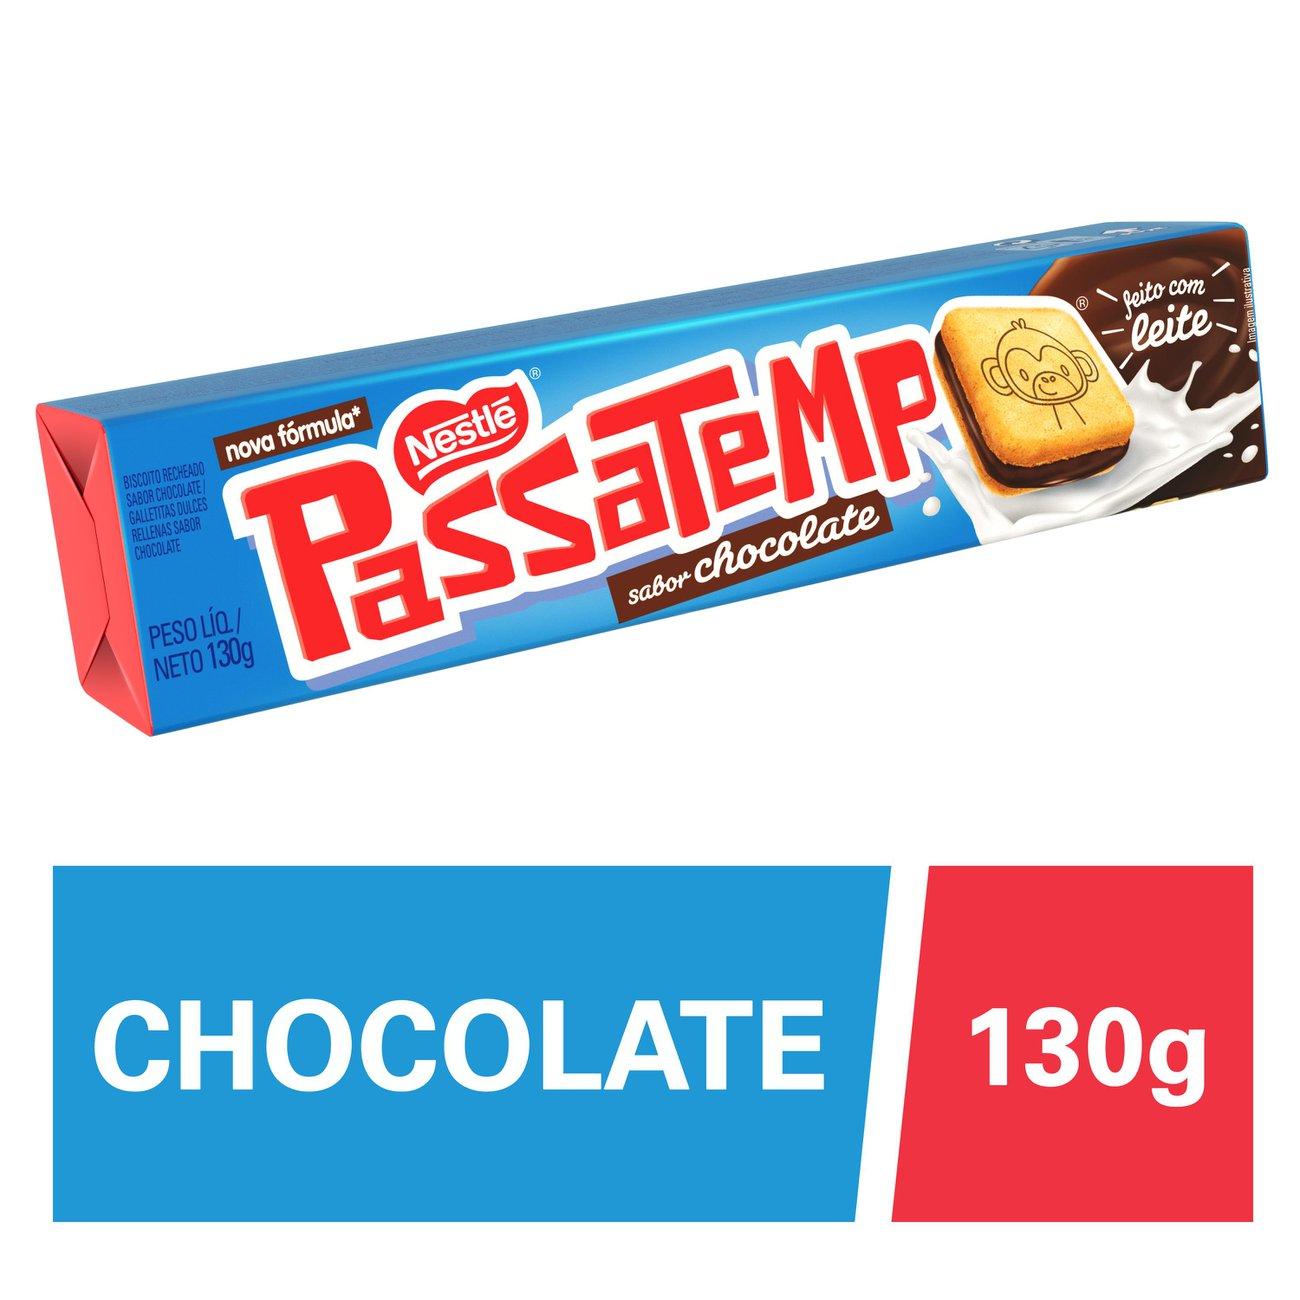 Biscoito Recheado Nestle Passatempo Chocolate 130G